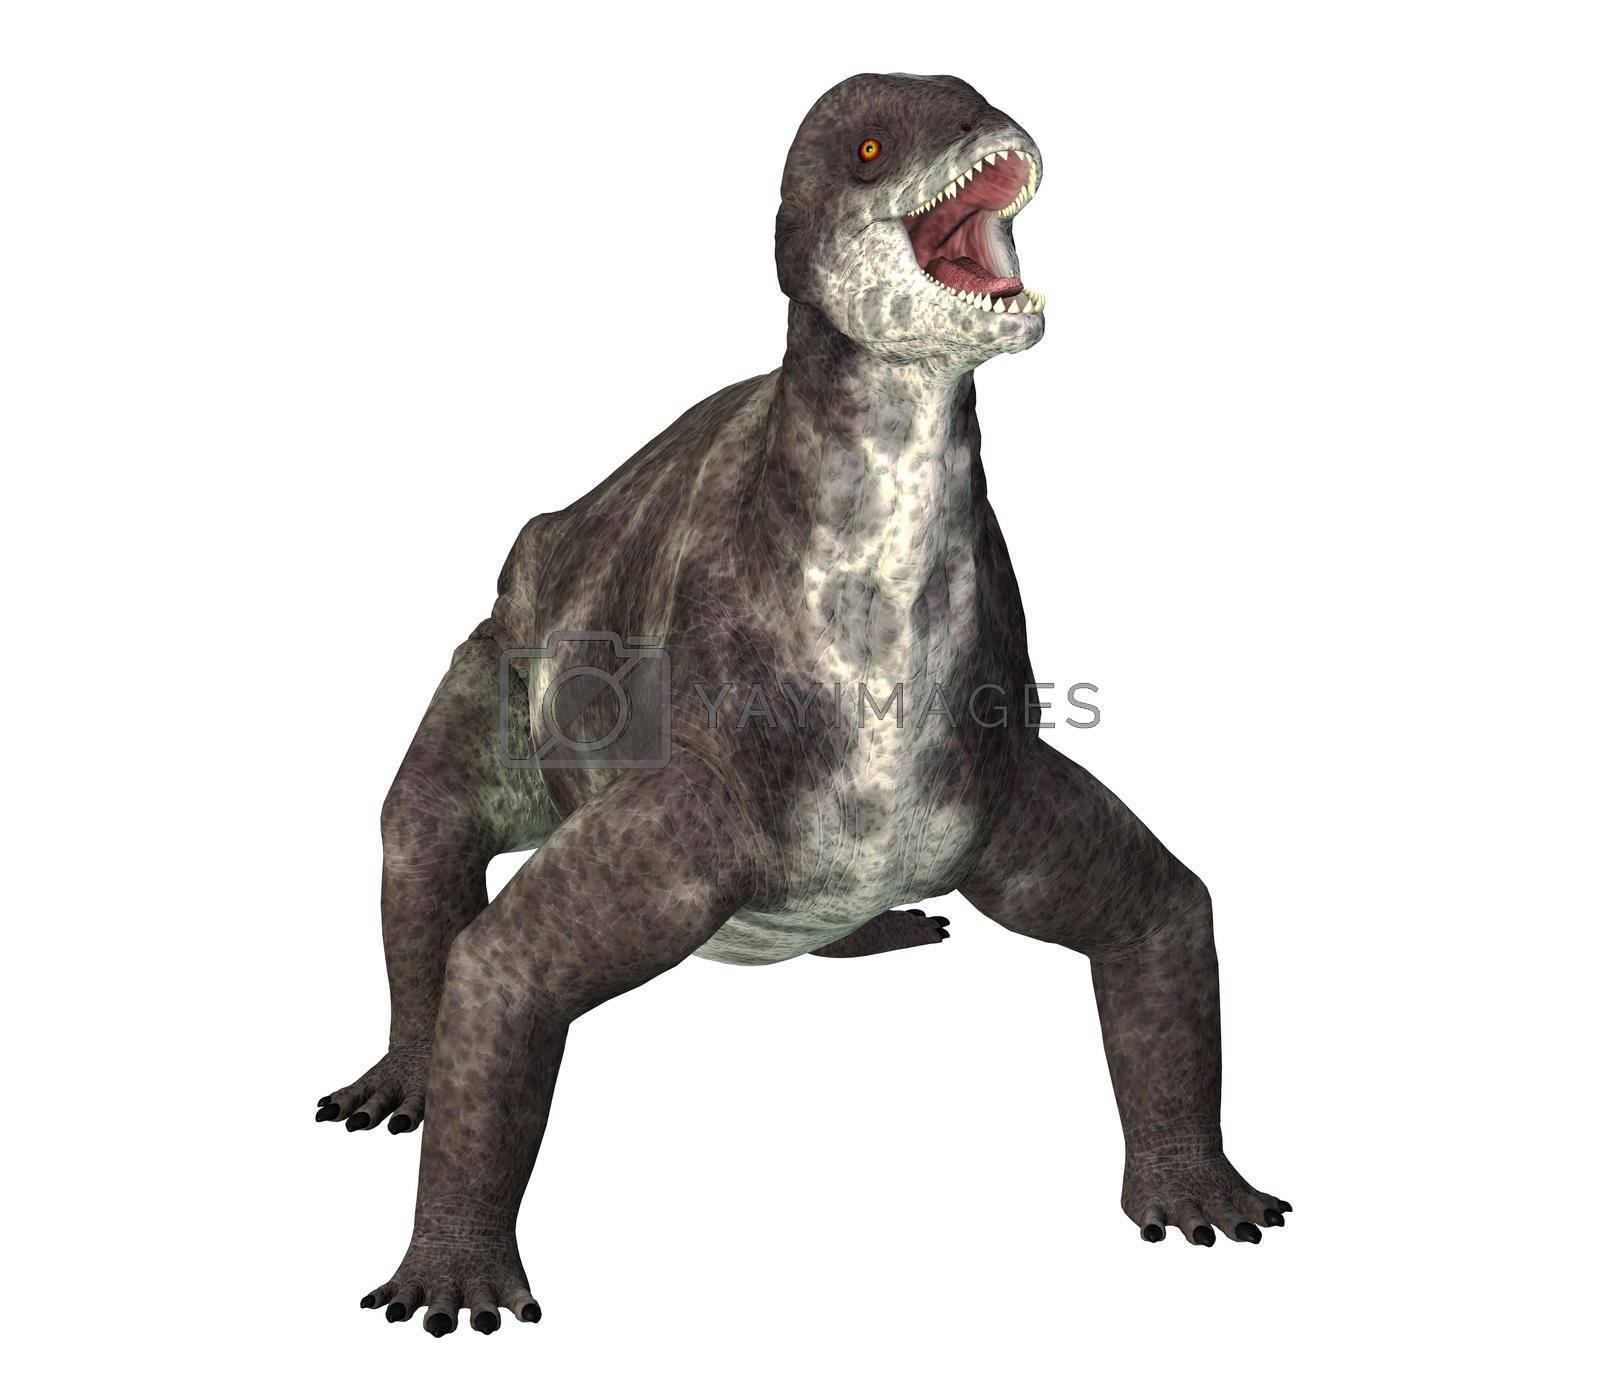 Royalty free image of Criocephalosaurus Dinosaur on White by Catmando